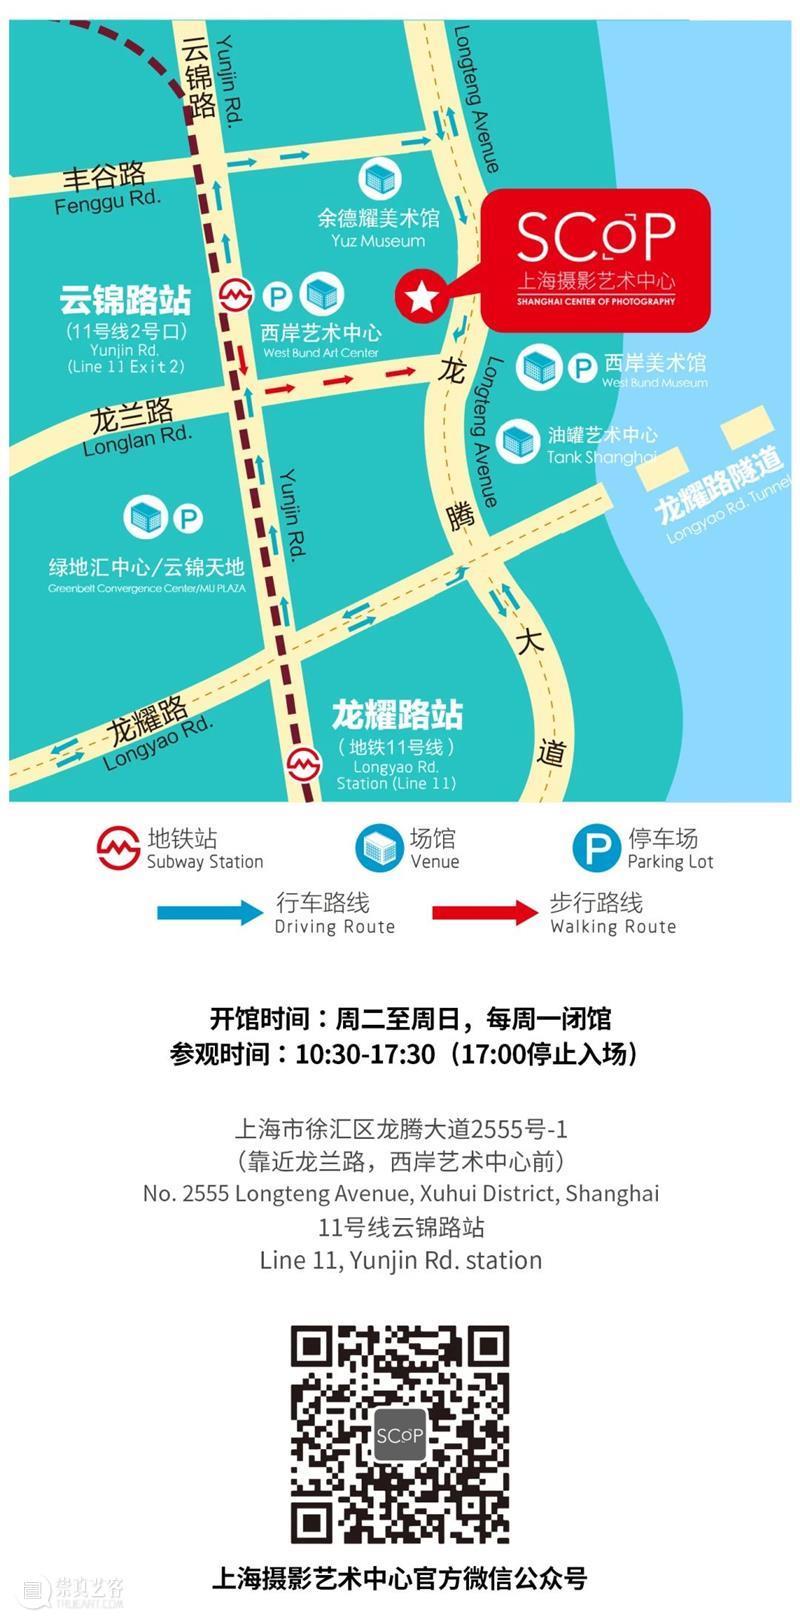 SCôP 公告 | 国庆节期间正常开馆 期间 公告 上海摄影艺术中心 公众 当前 希望 Pictet SCoP 线上 通道 崇真艺客